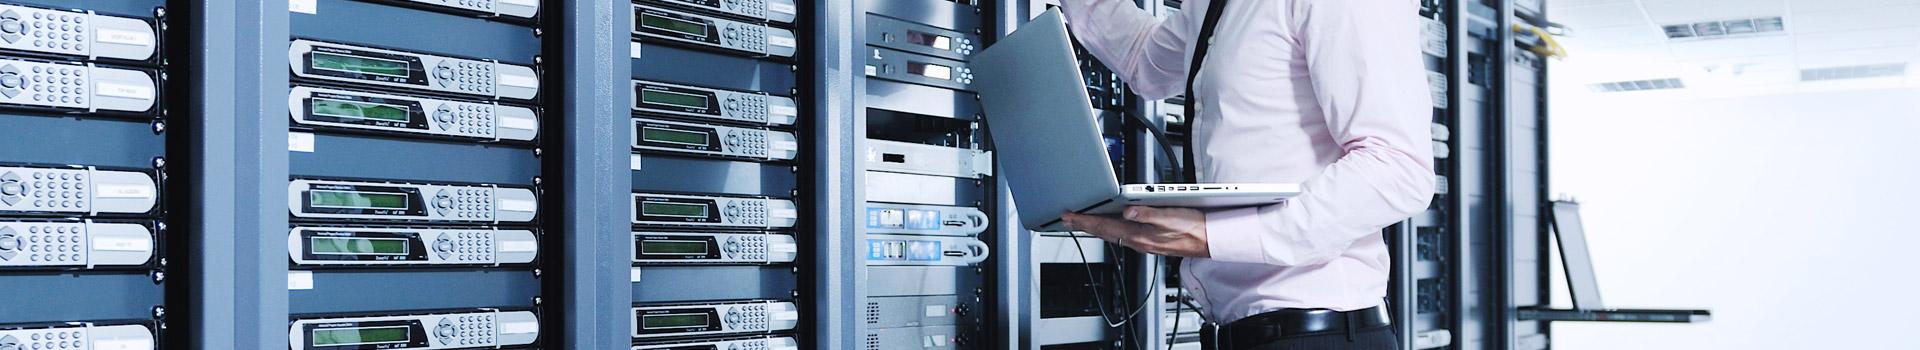 slide hosting server